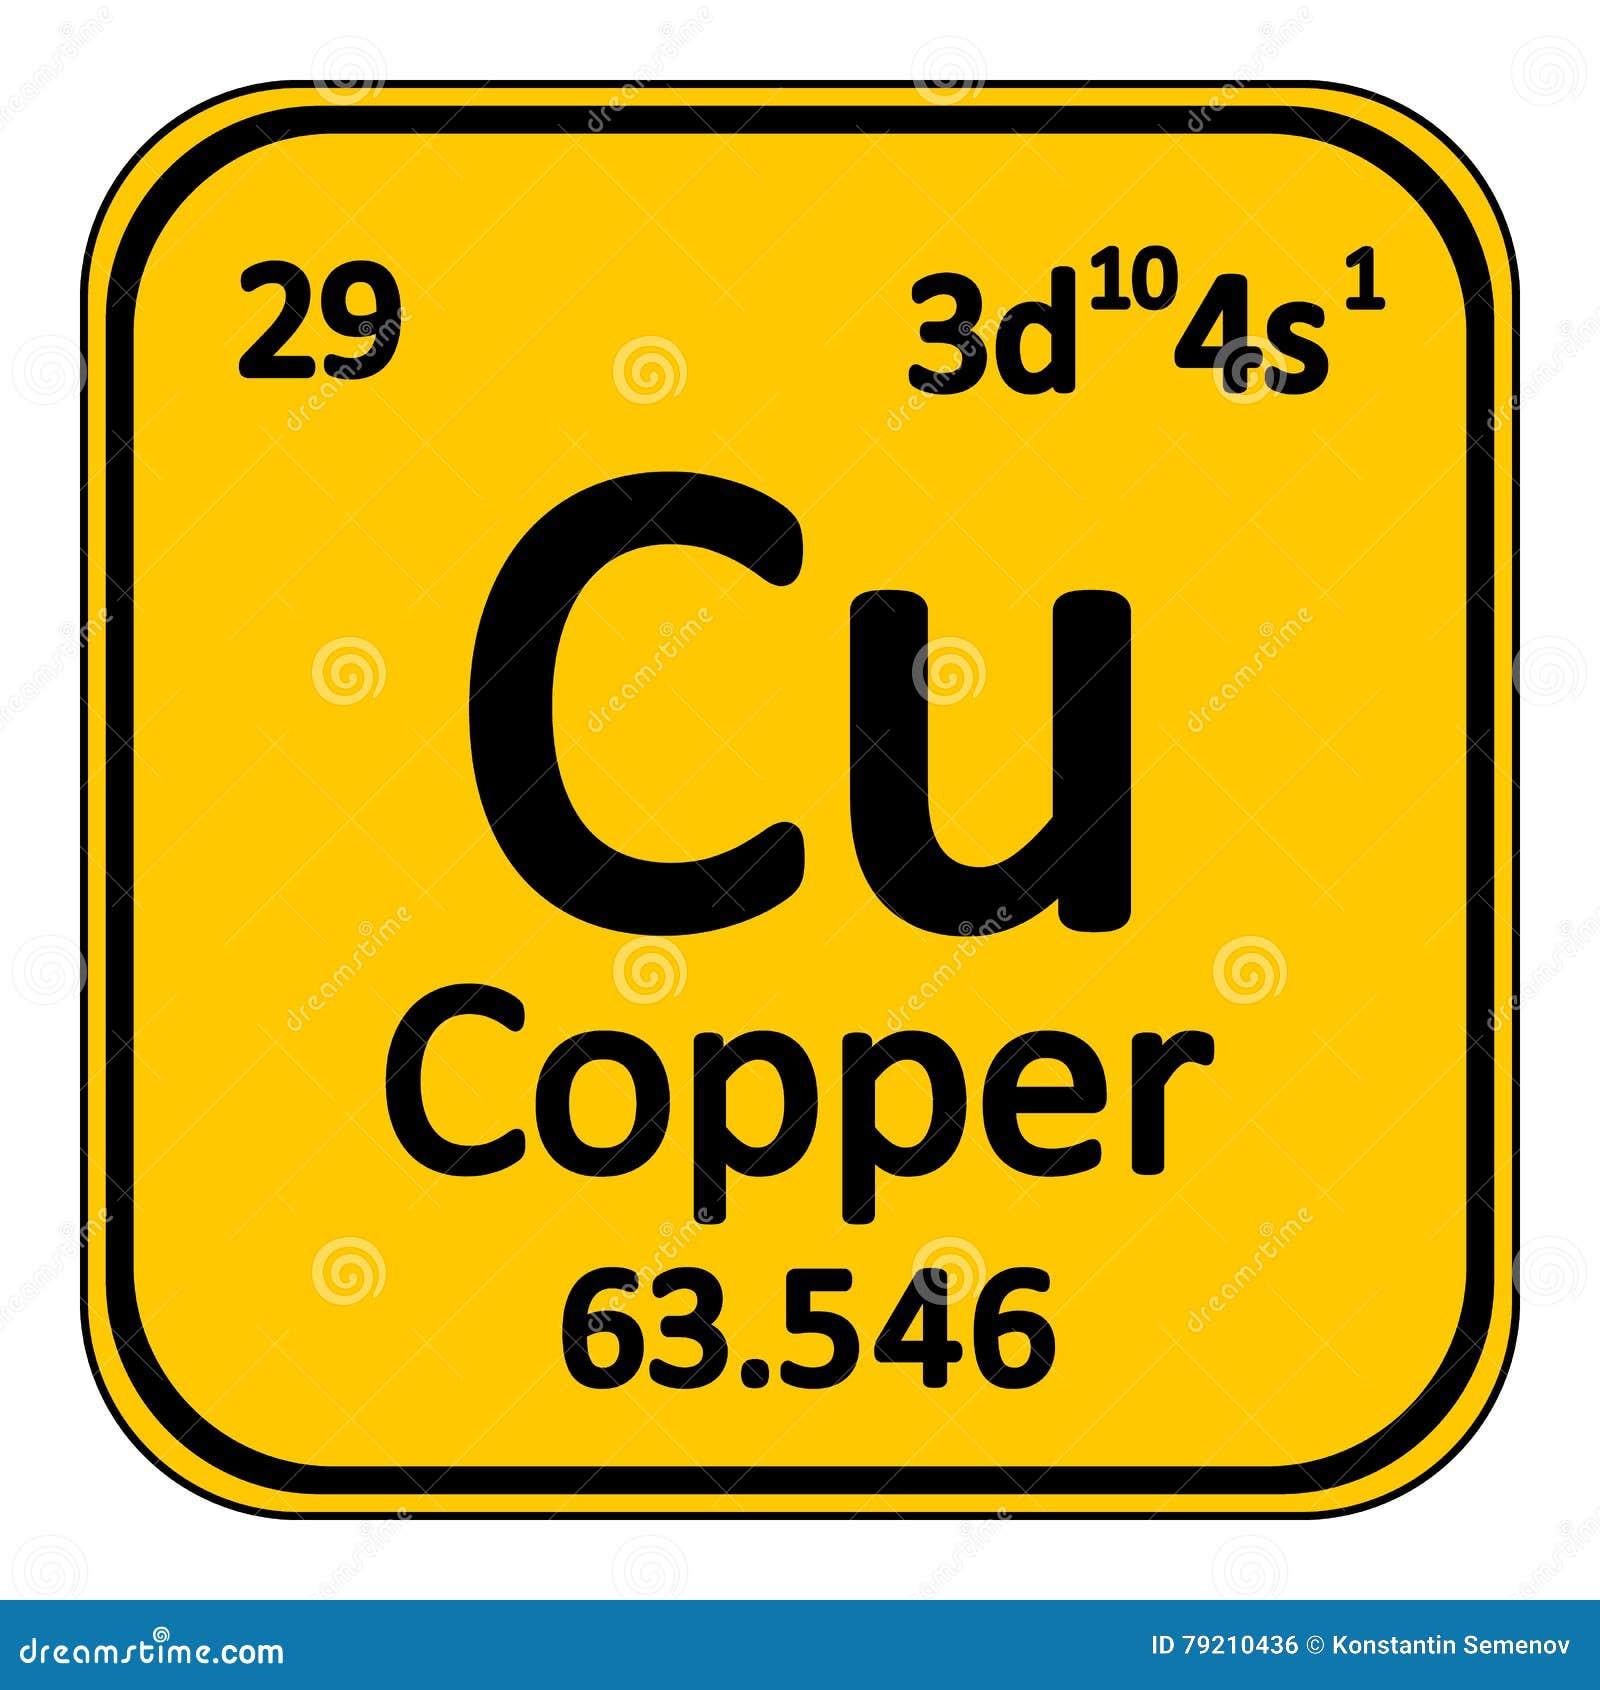 Periodic table element copper icon stock illustration periodic table element copper icon urtaz Choice Image